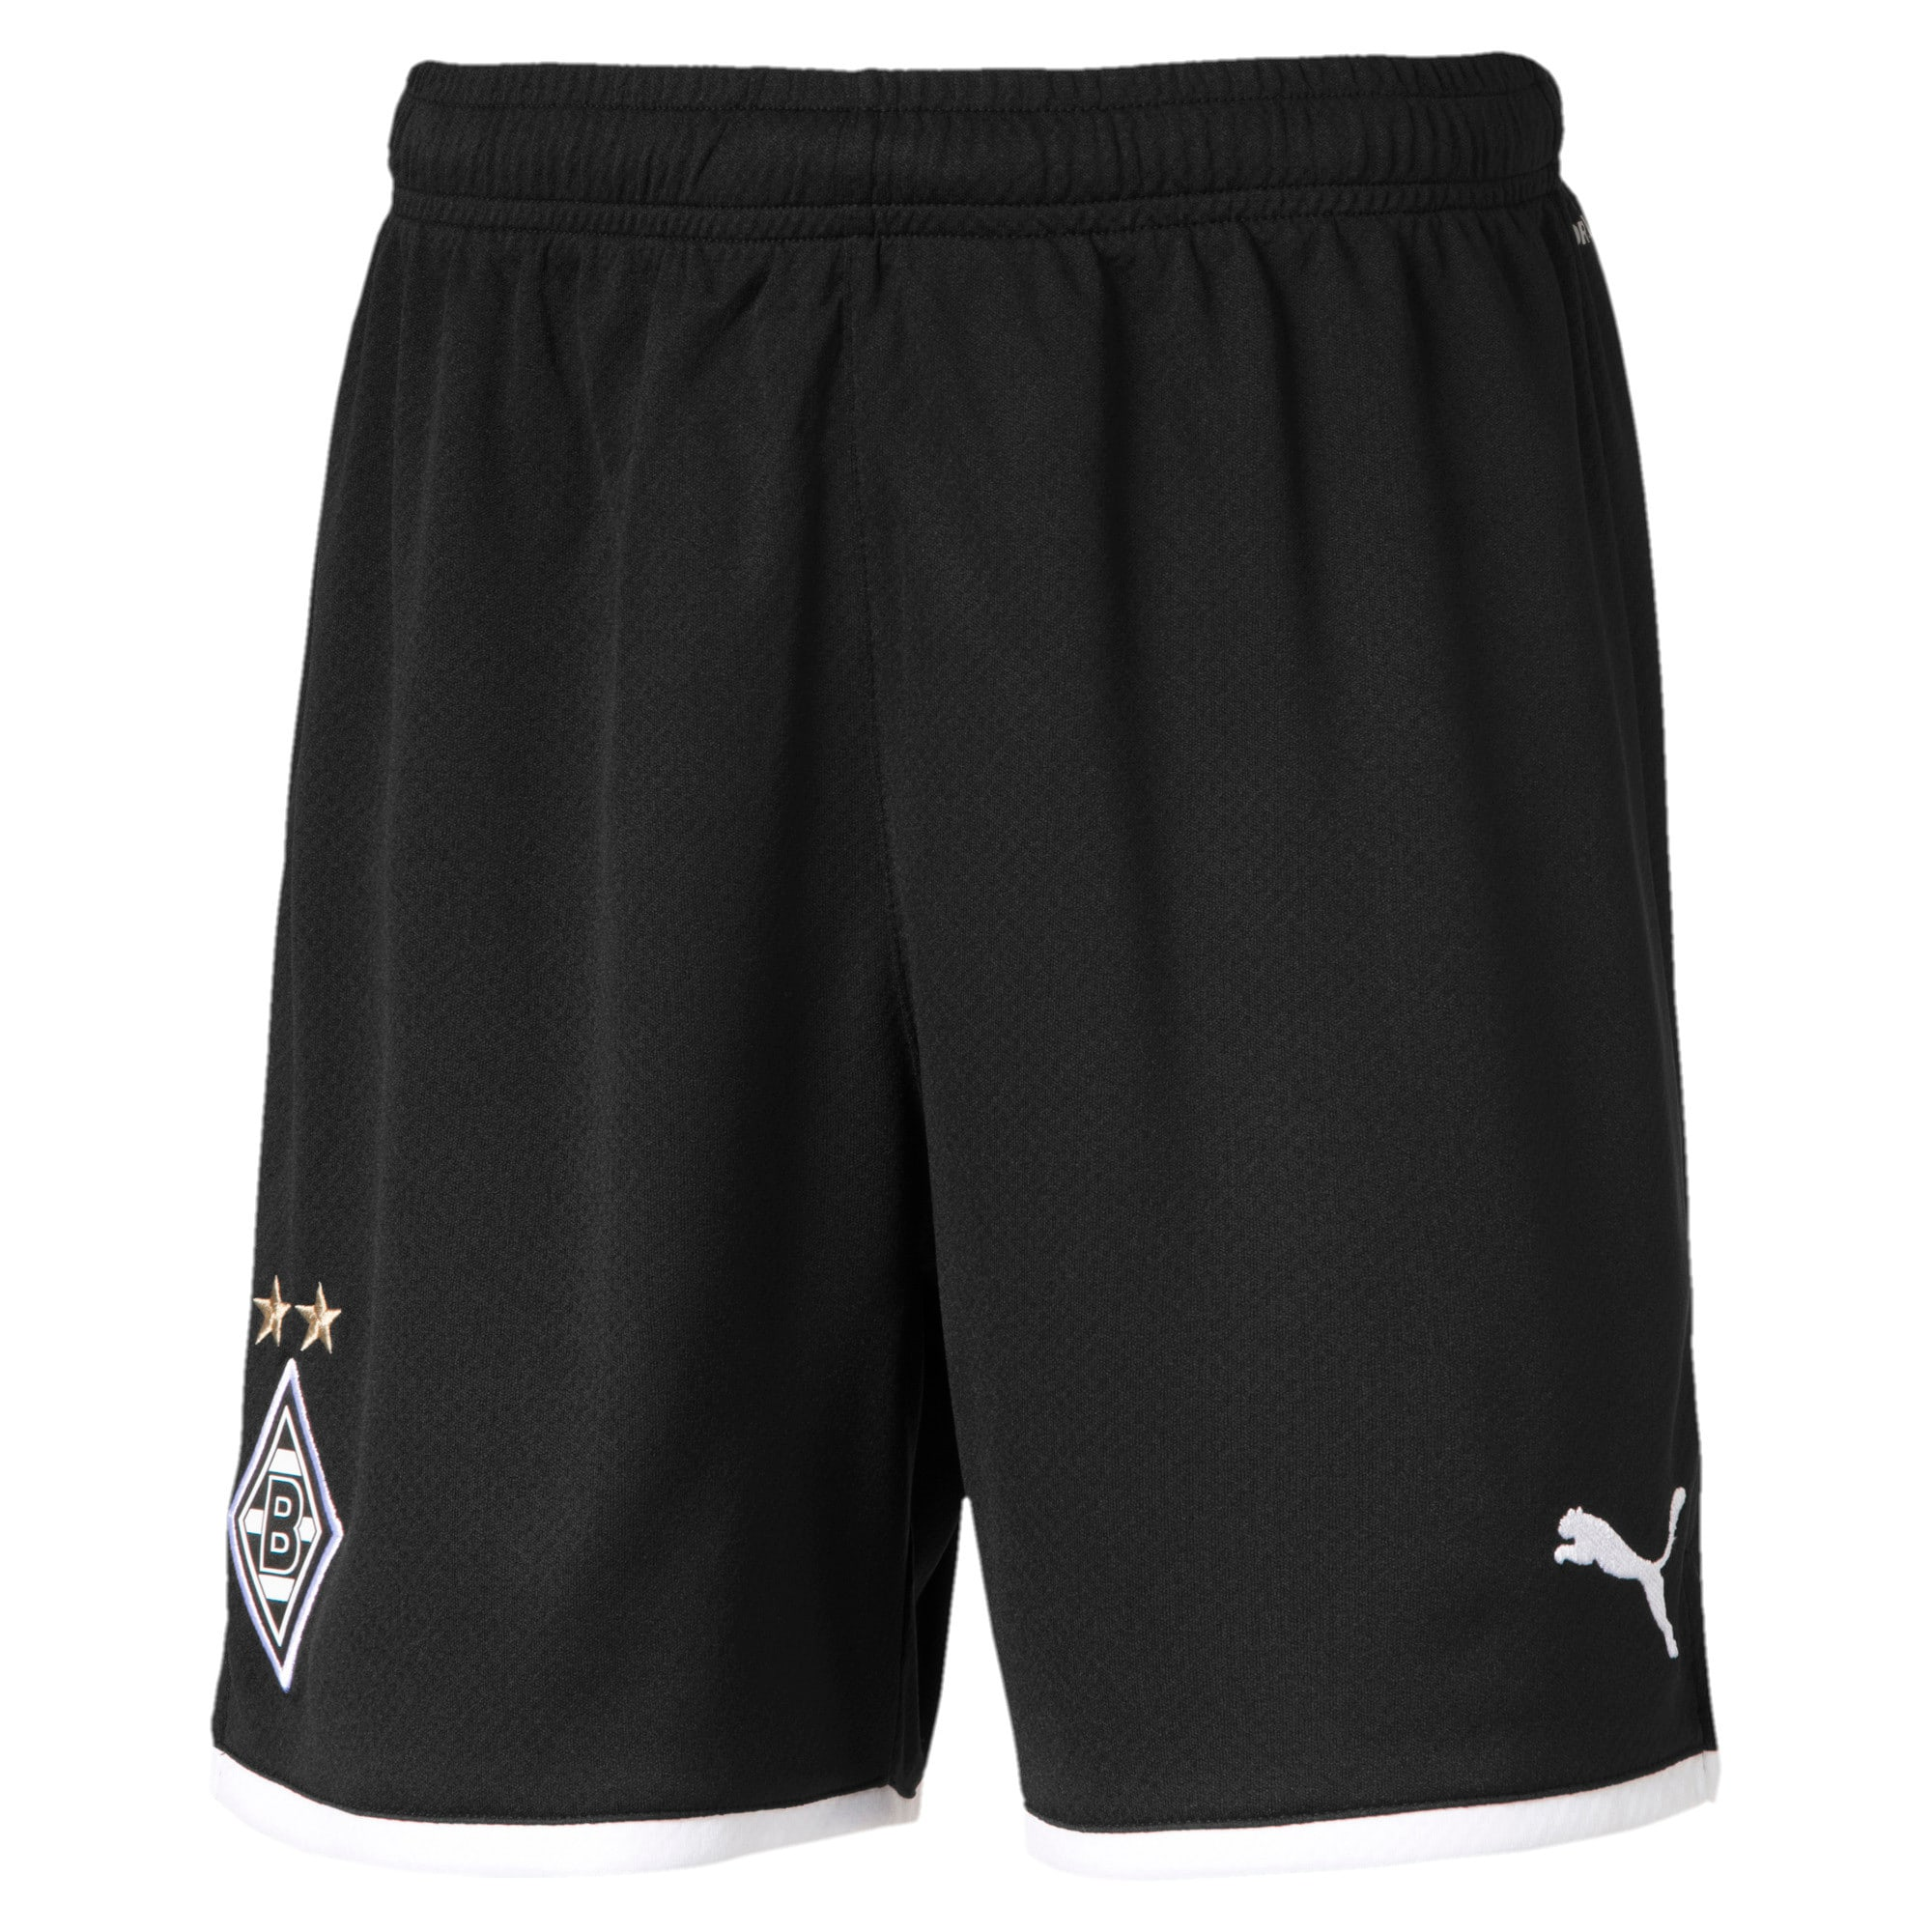 Thumbnail 1 of Borussia Mönchengladbach Boys' Replica Shorts, Puma Black, medium